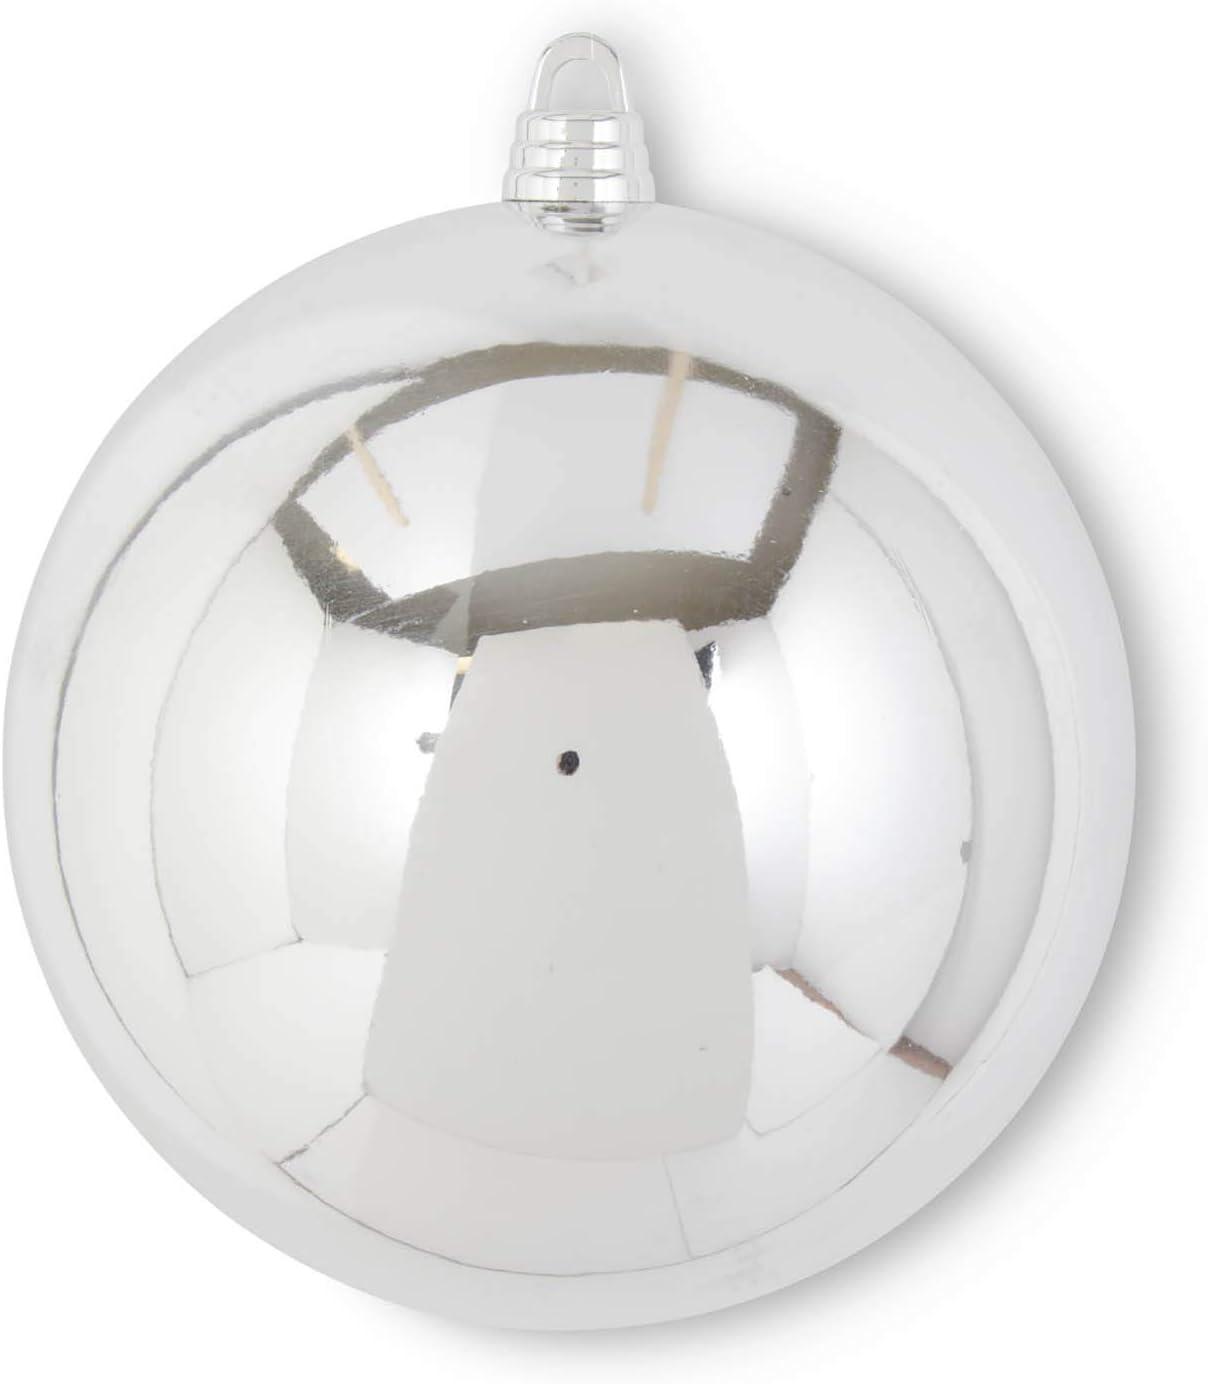 KK Interiors 54104F-SI 14.5 Inch Shiny Arlington Mall Silver Shatterproof Selling Orna